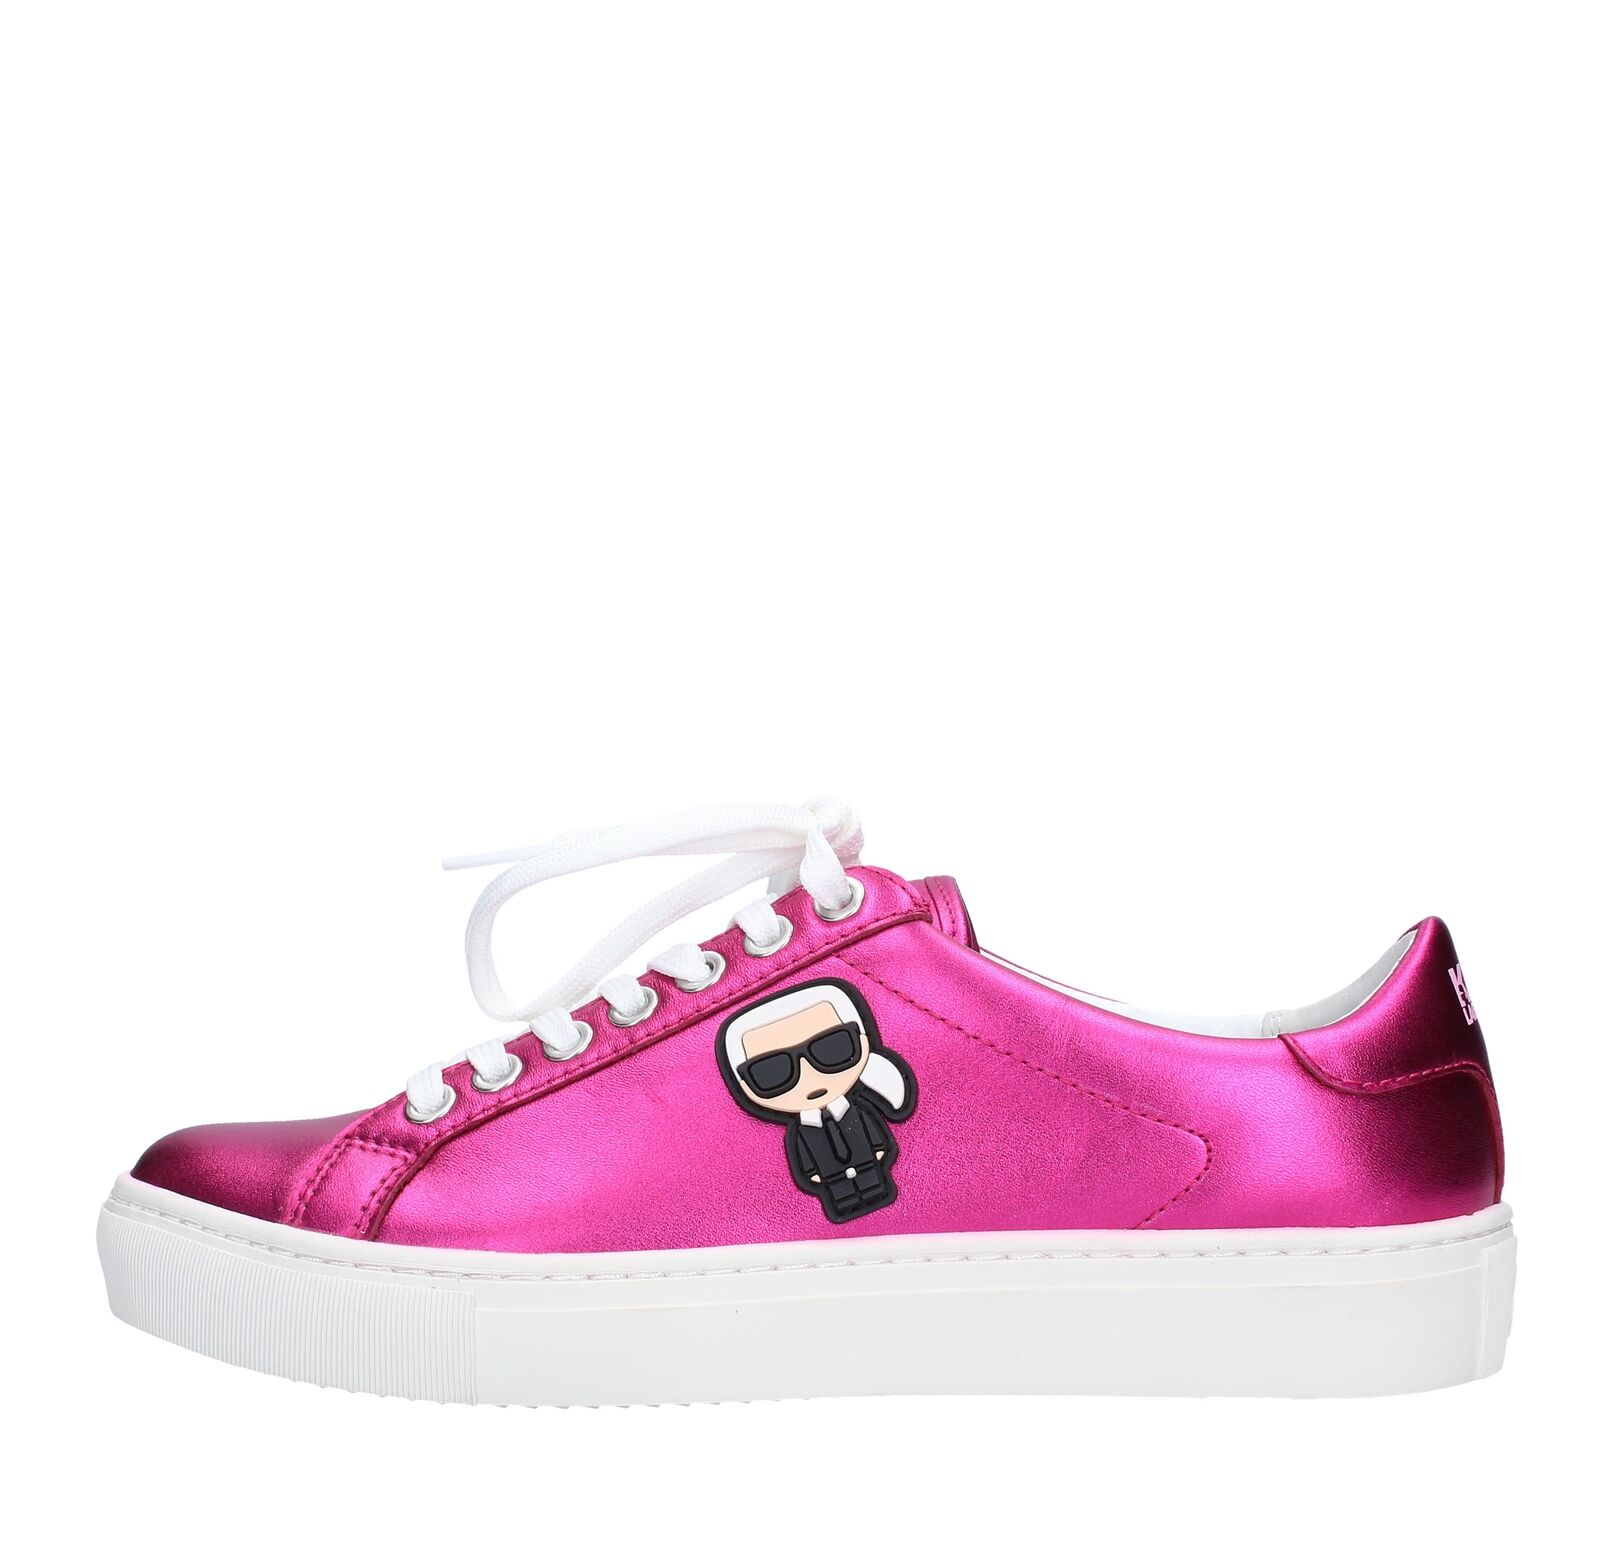 AMF19_KARL Scarpe scarpe da ginnastica KARL LAGERFELD donna Fuxia